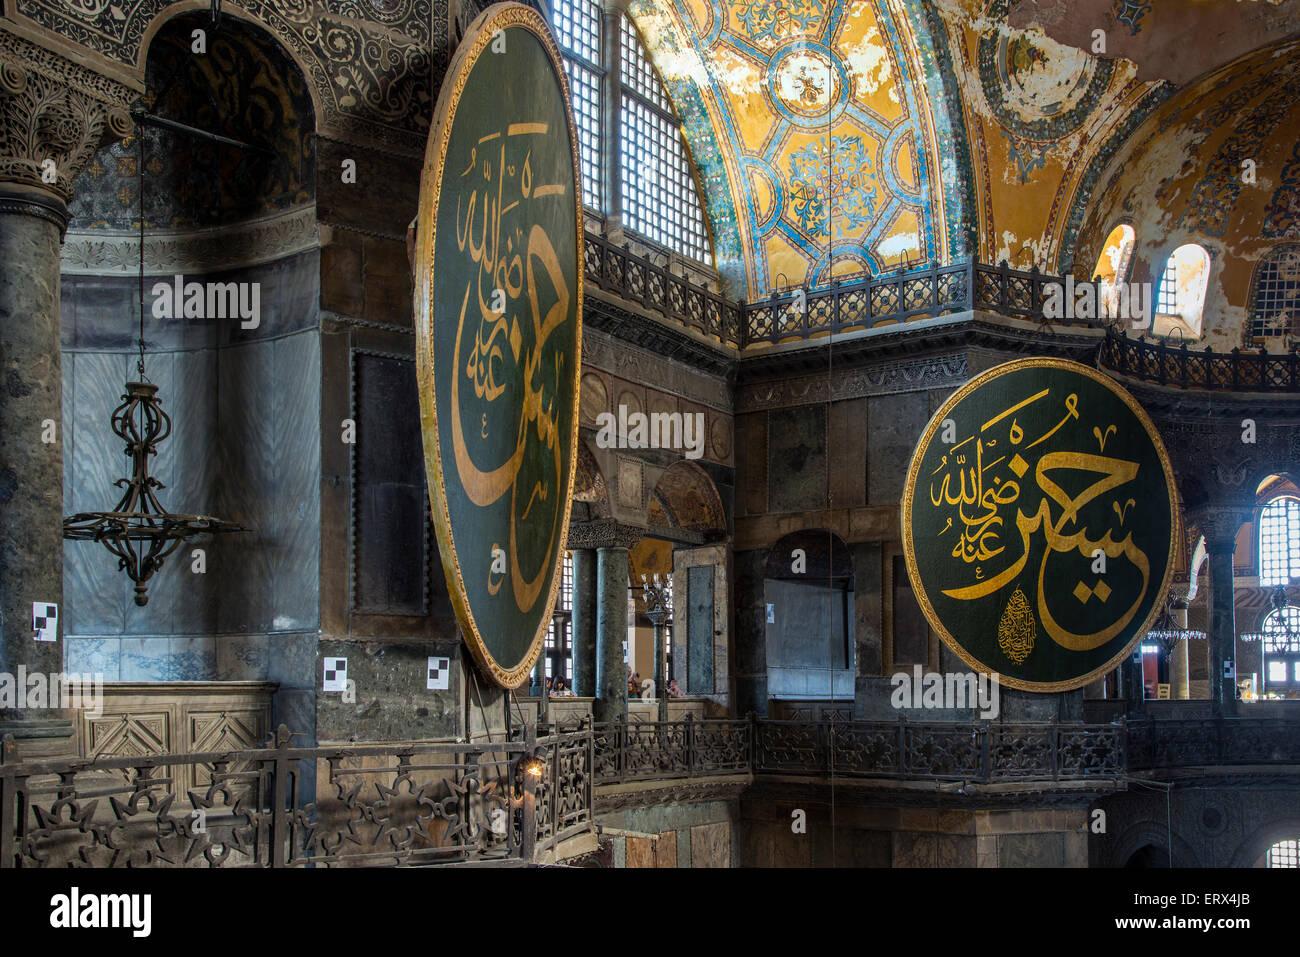 Interior top view of Hagia Sophia with Ottoman medallion, Sultanahmet, Istanbul, Turkey - Stock Image